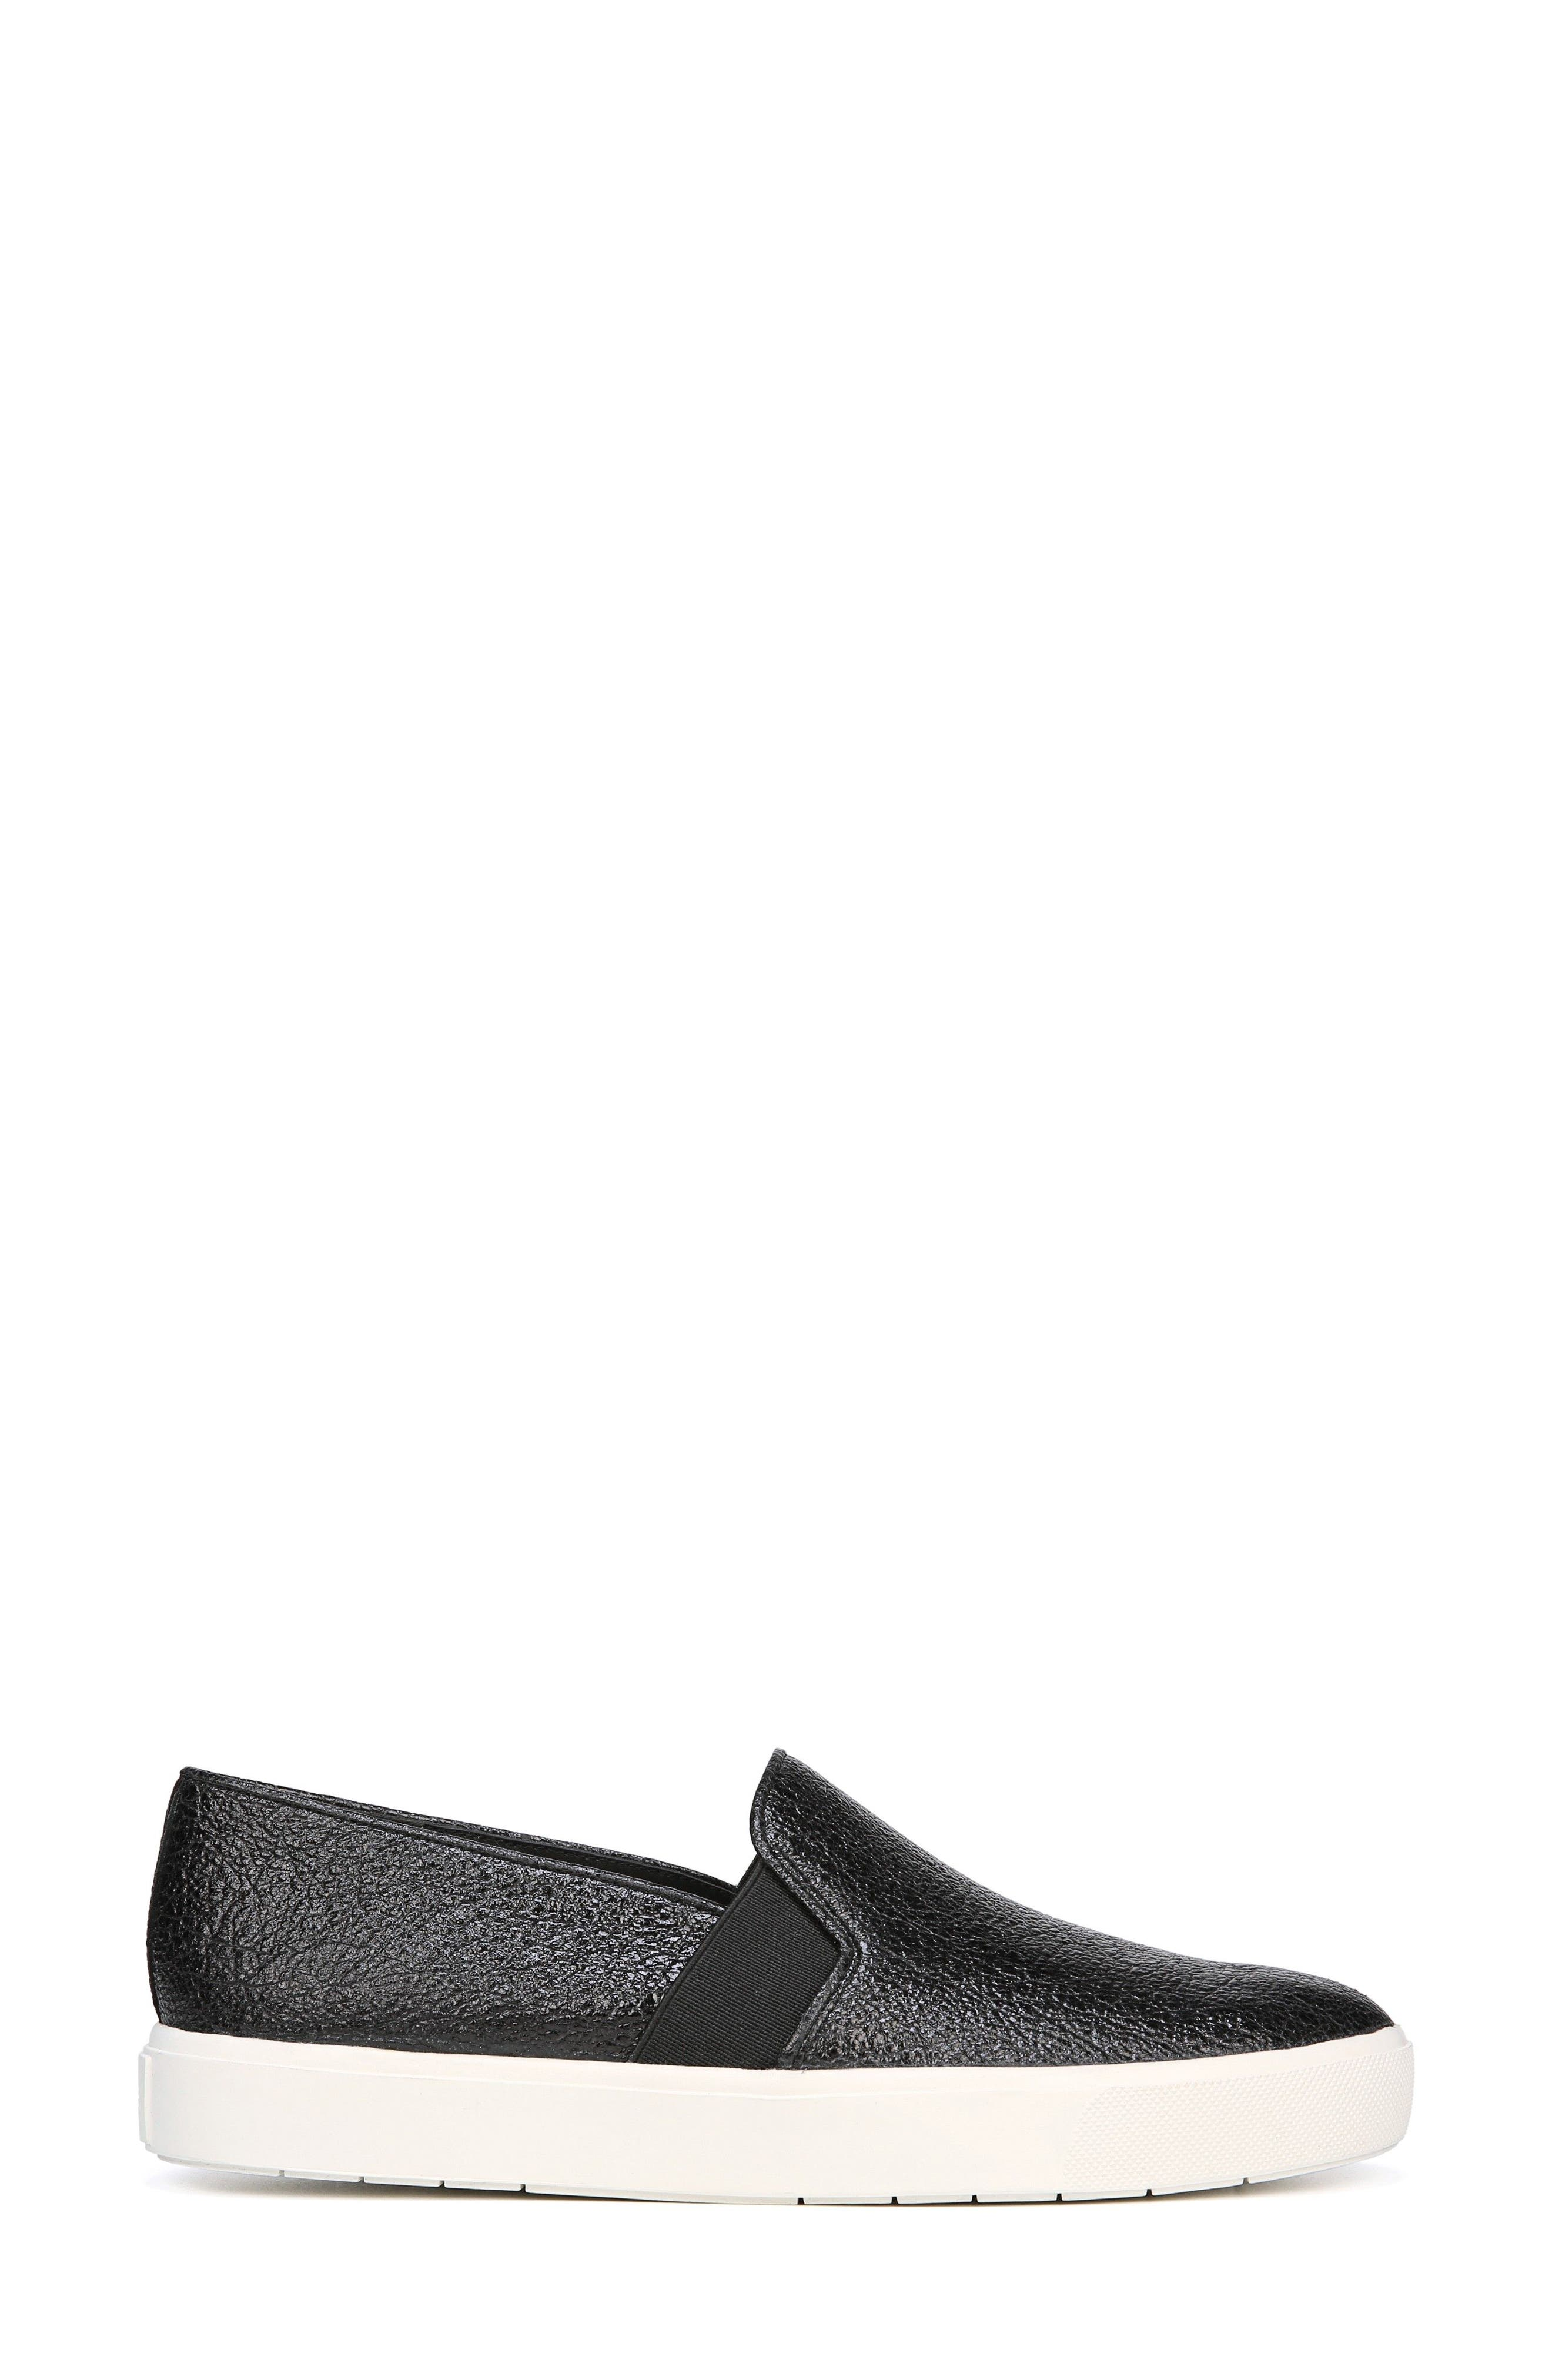 'Blair 12' Leather Slip-On Sneaker,                             Alternate thumbnail 3, color,                             BLACK LEATHER